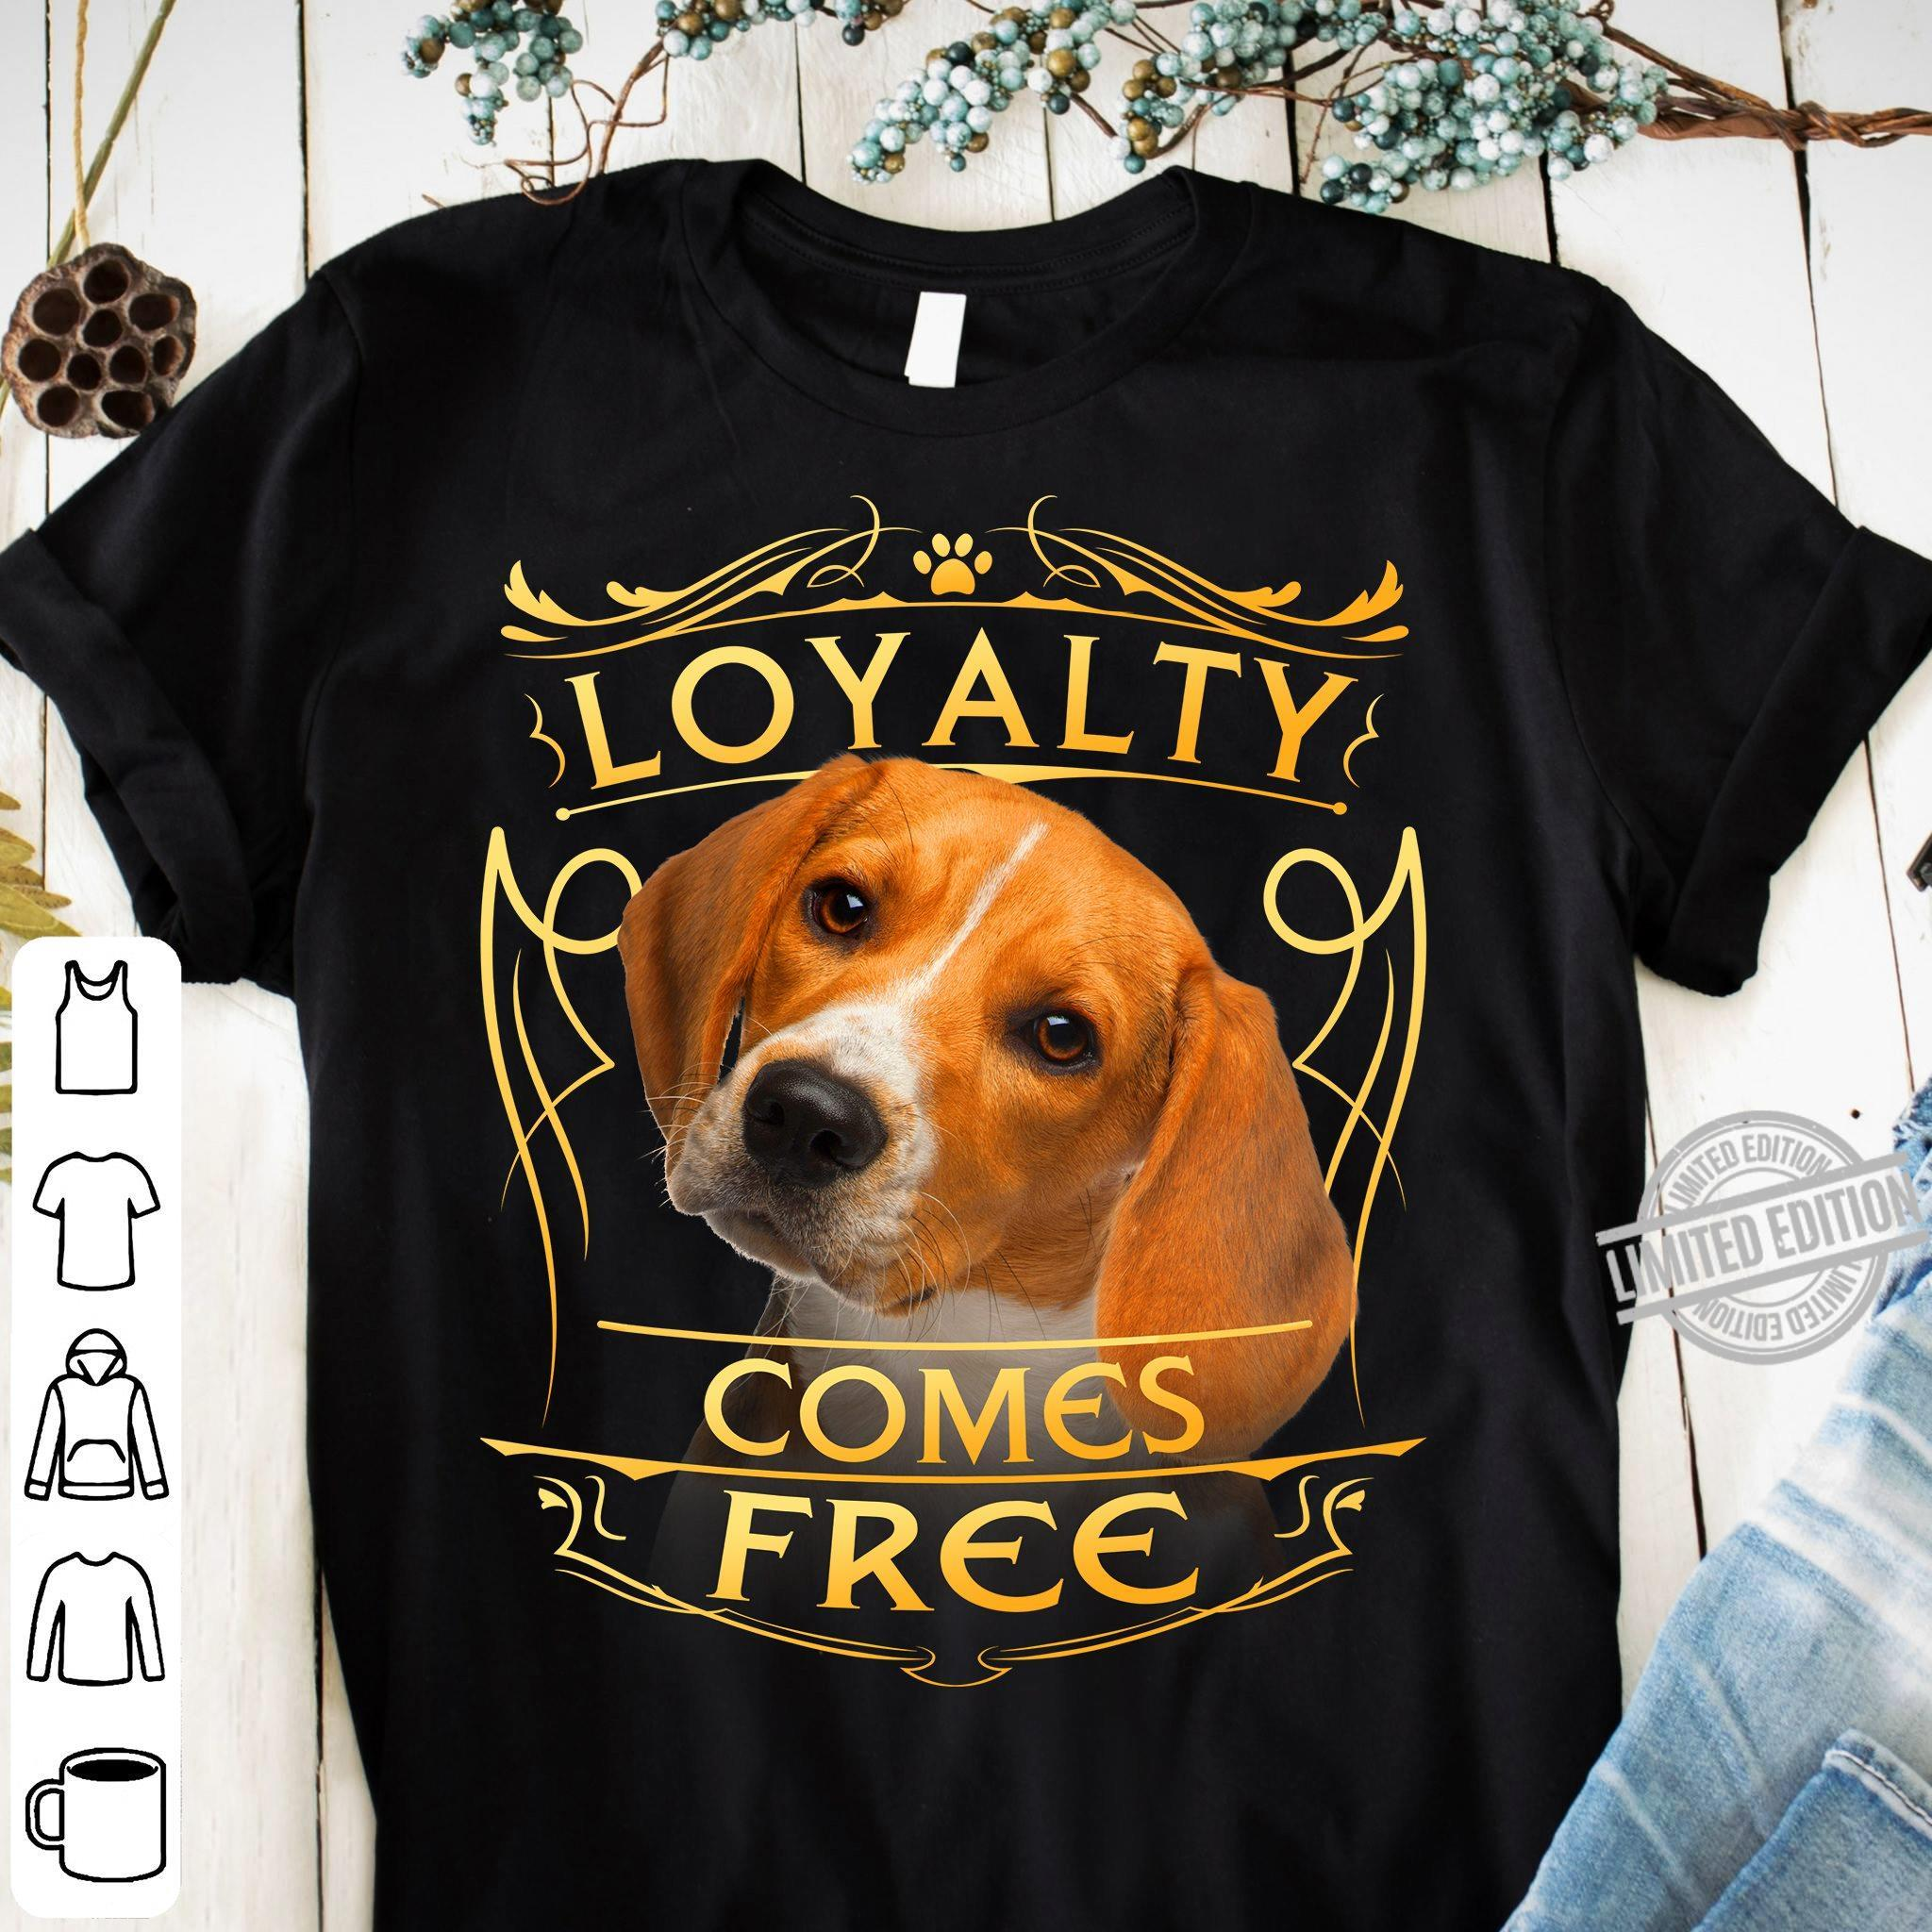 Loyalty Comes Free Shirt